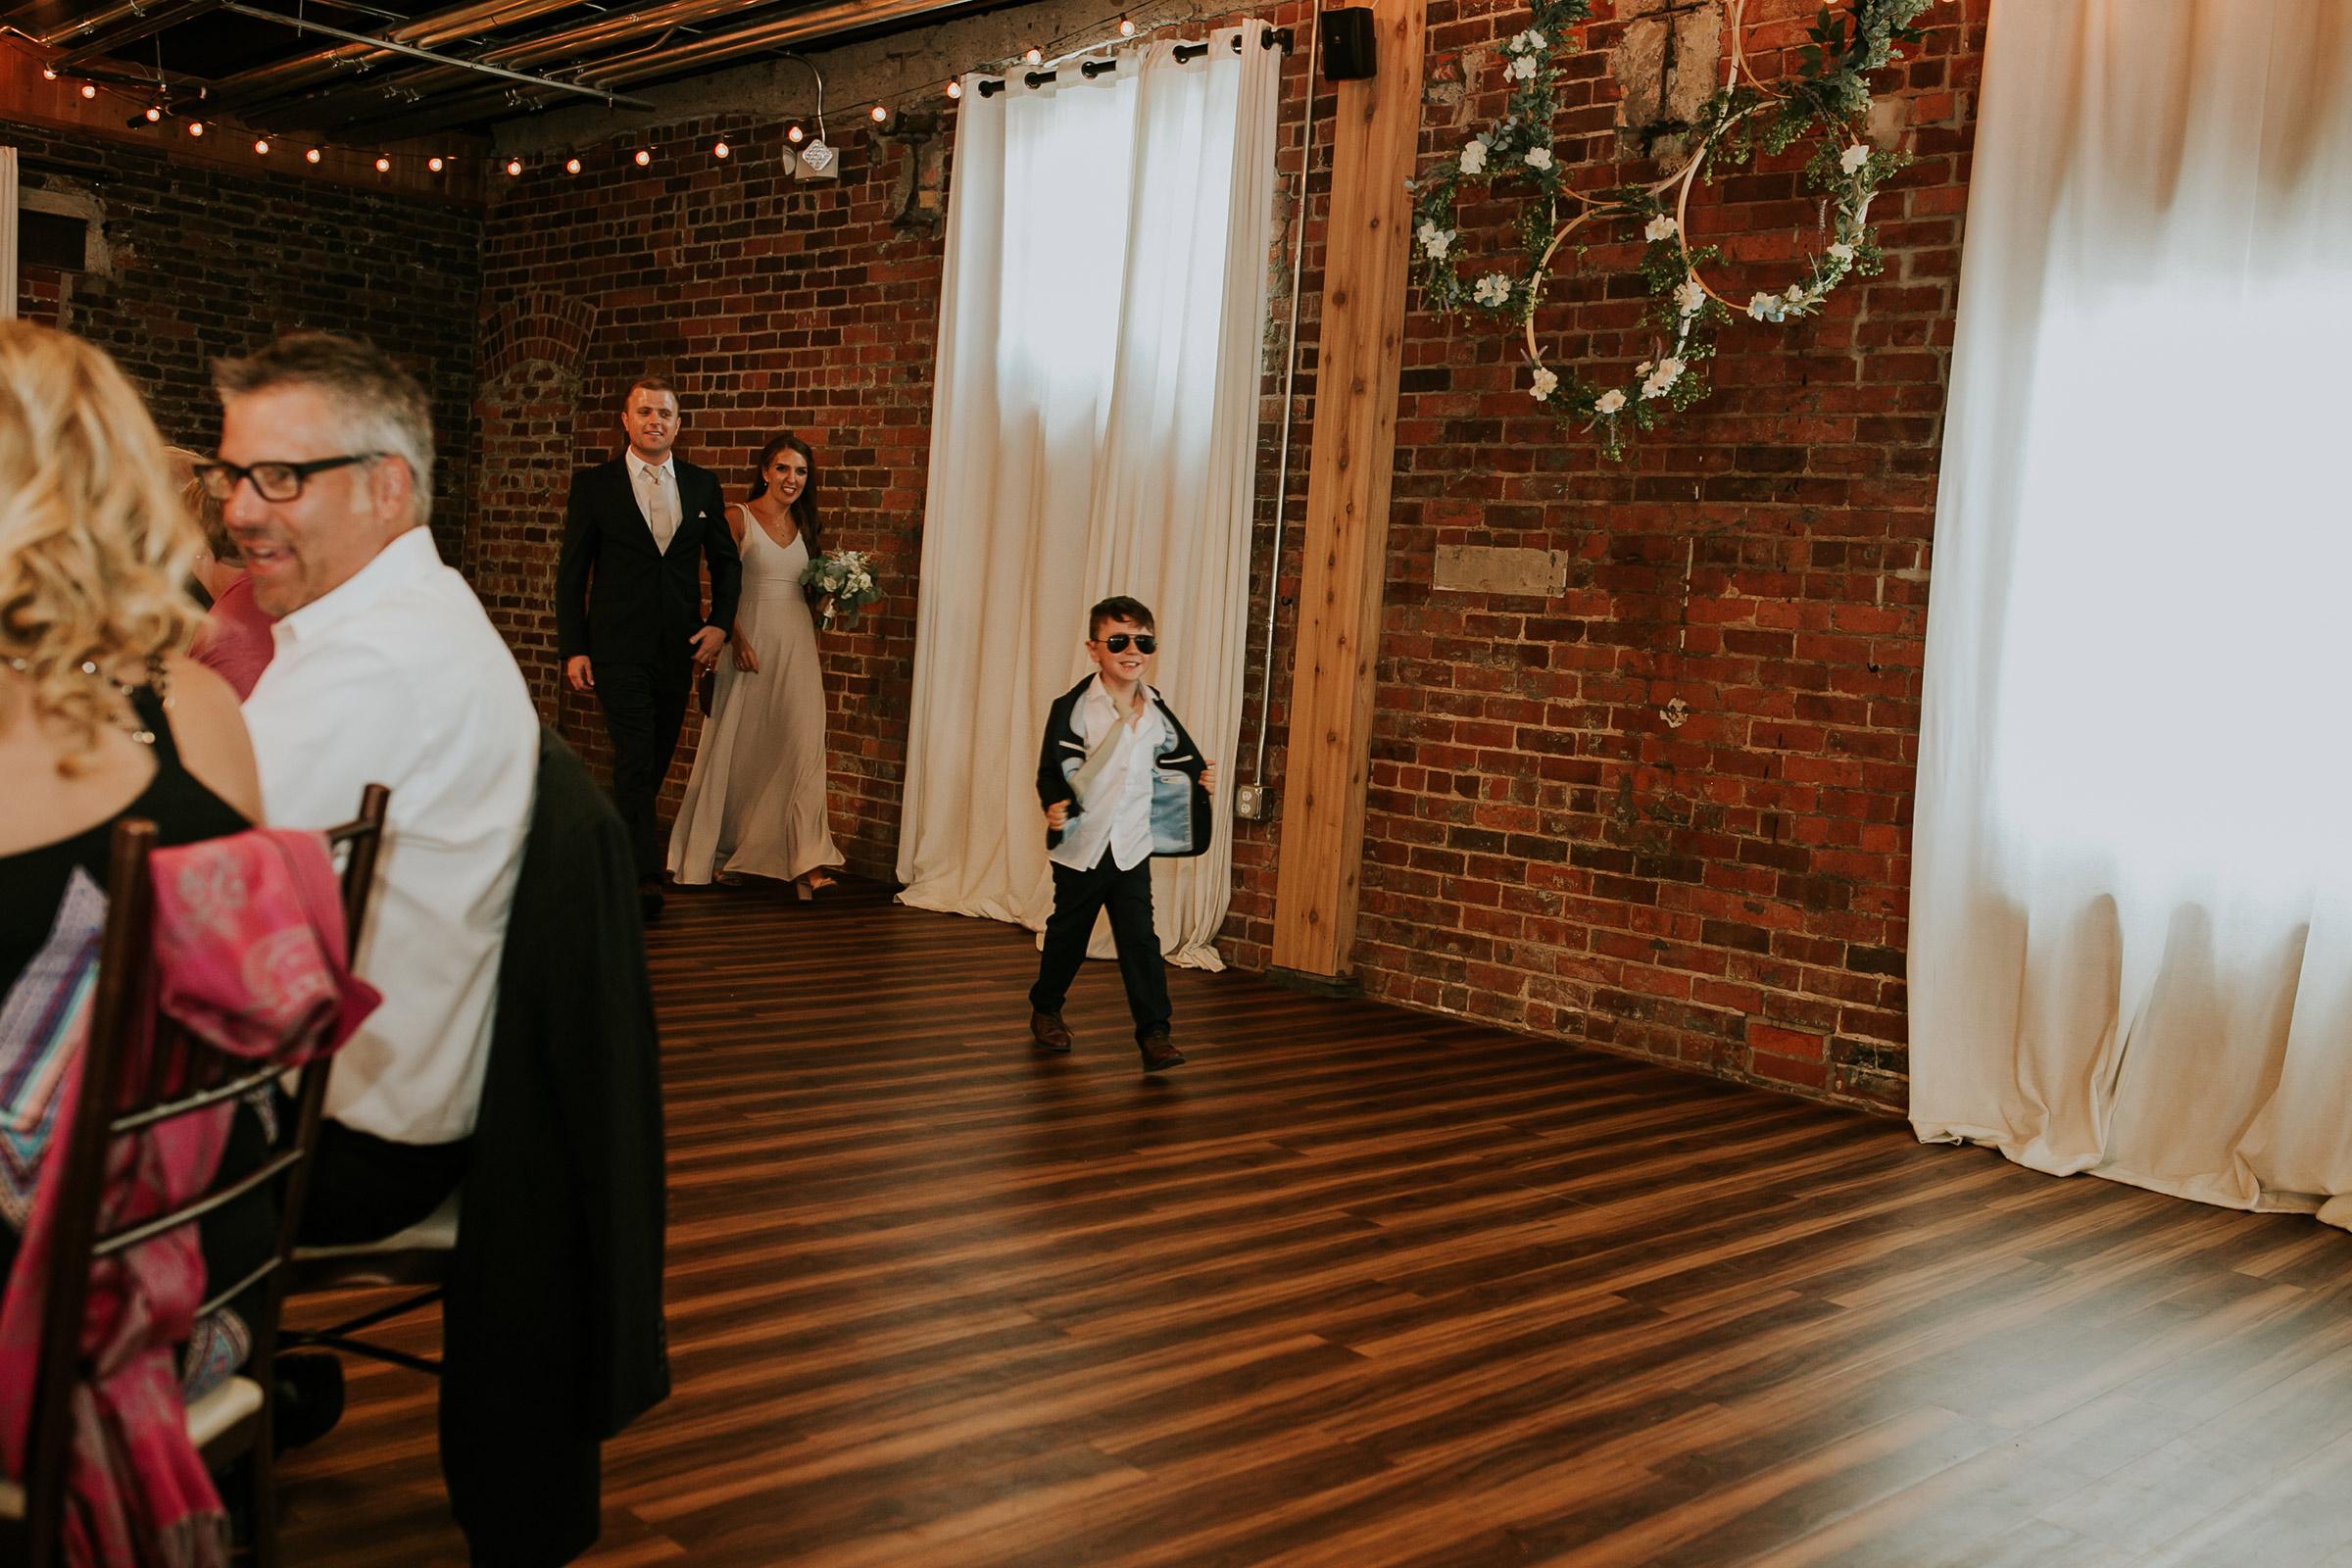 mr-mrs-hull-wedding-guests-enterance-little-boy-taproom-desmoines-iowa-raelyn-ramey-photography-539.jpg